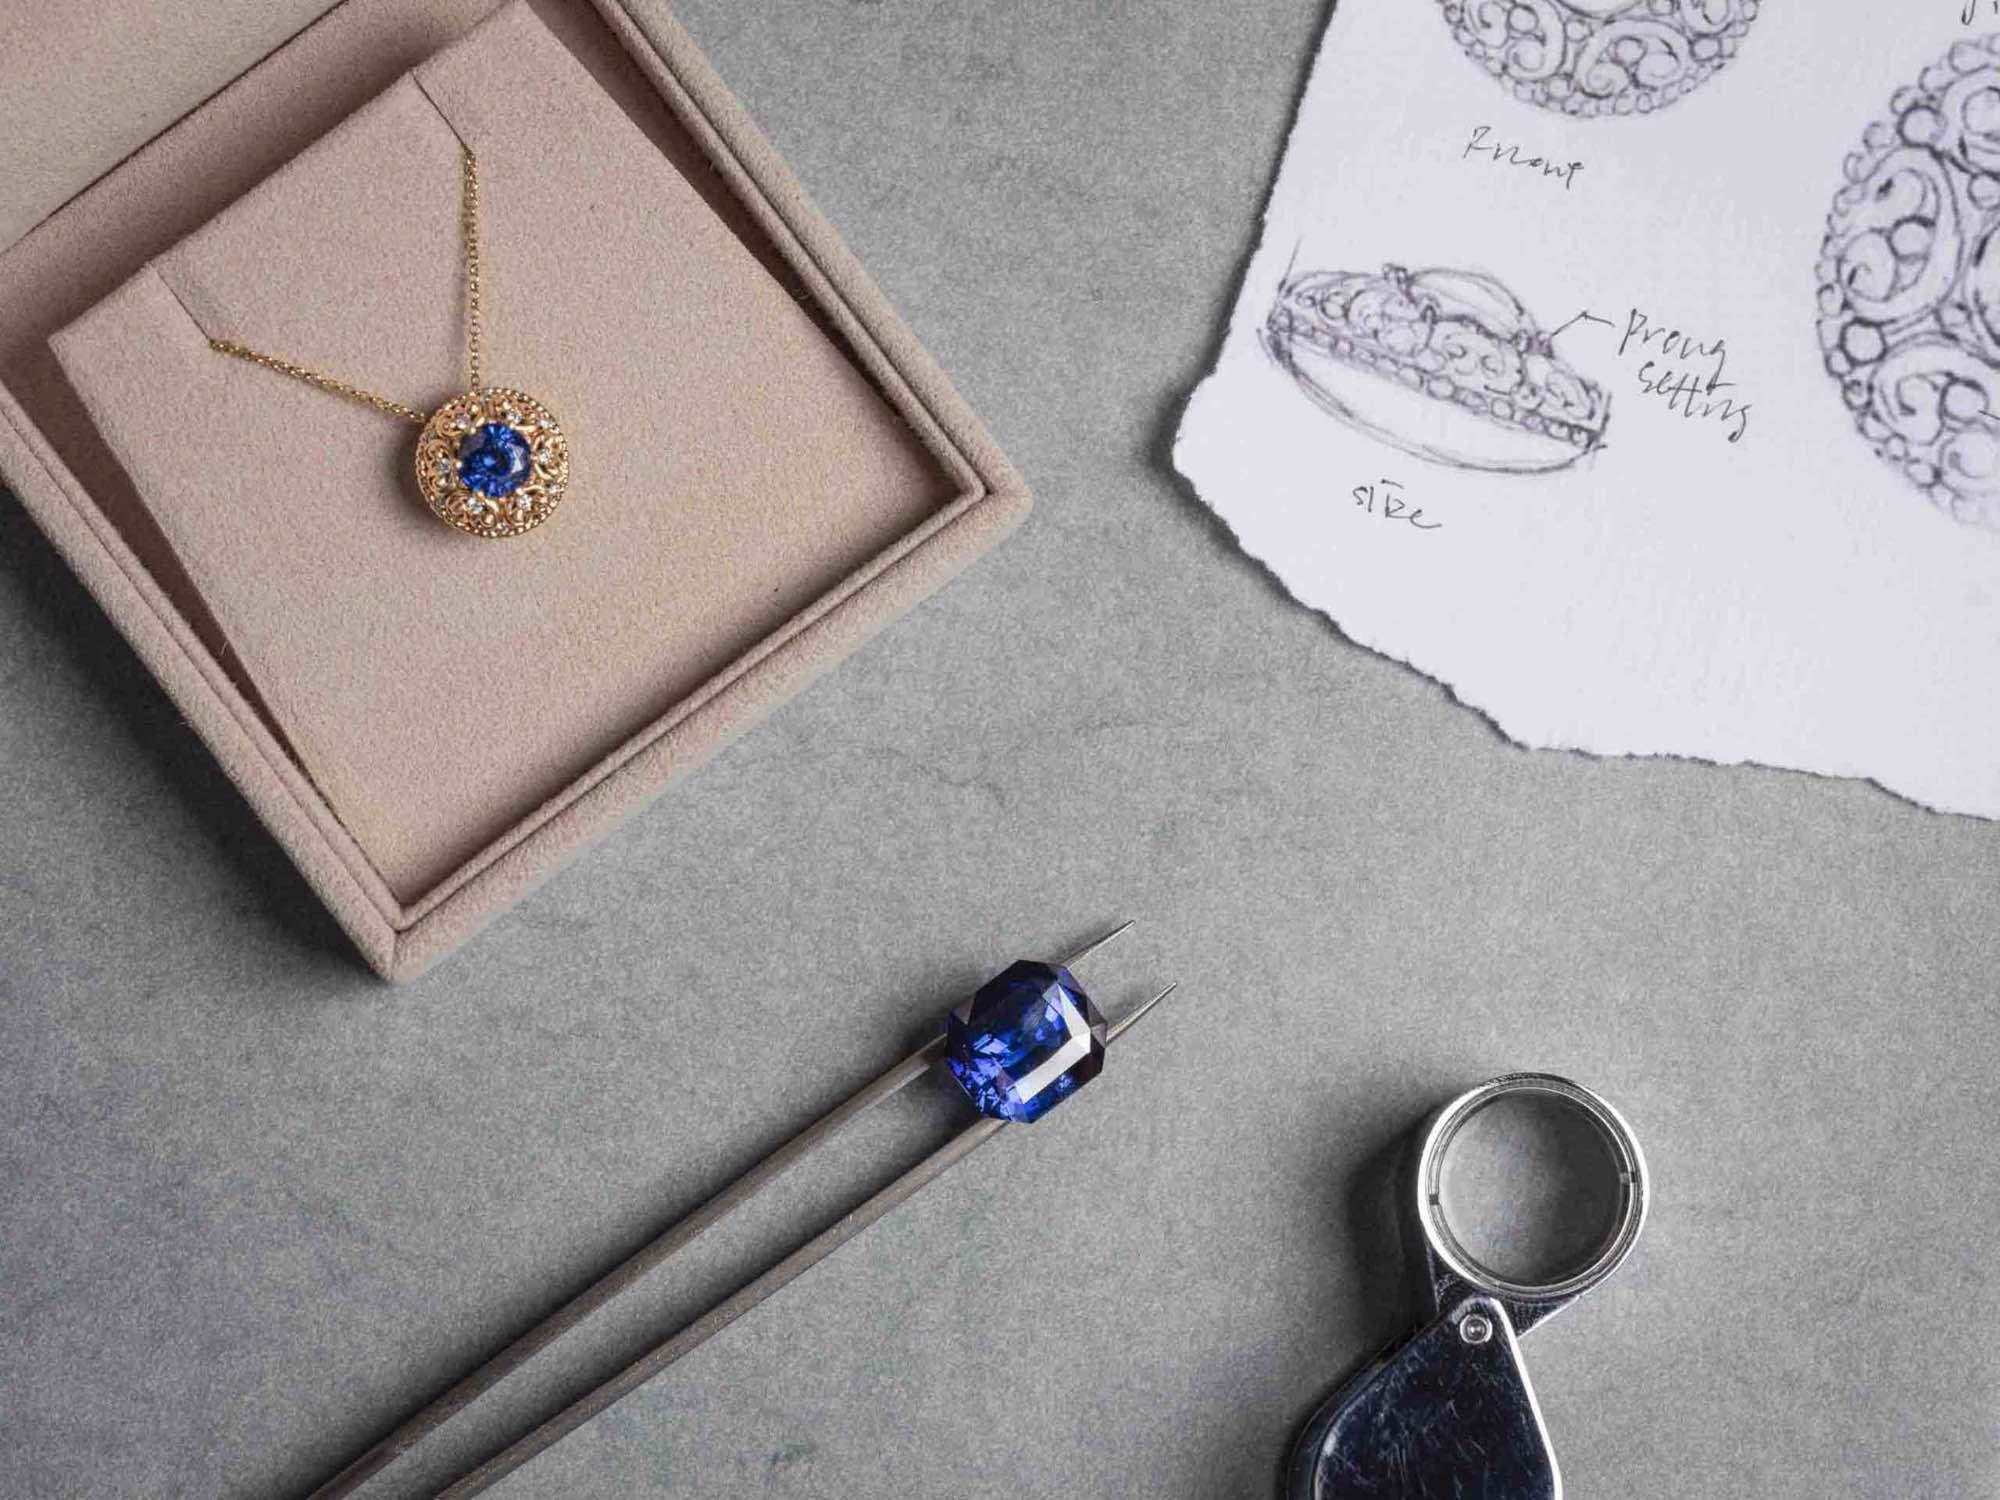 Jewellery Product Photography Singapore Jose Jeuland 5